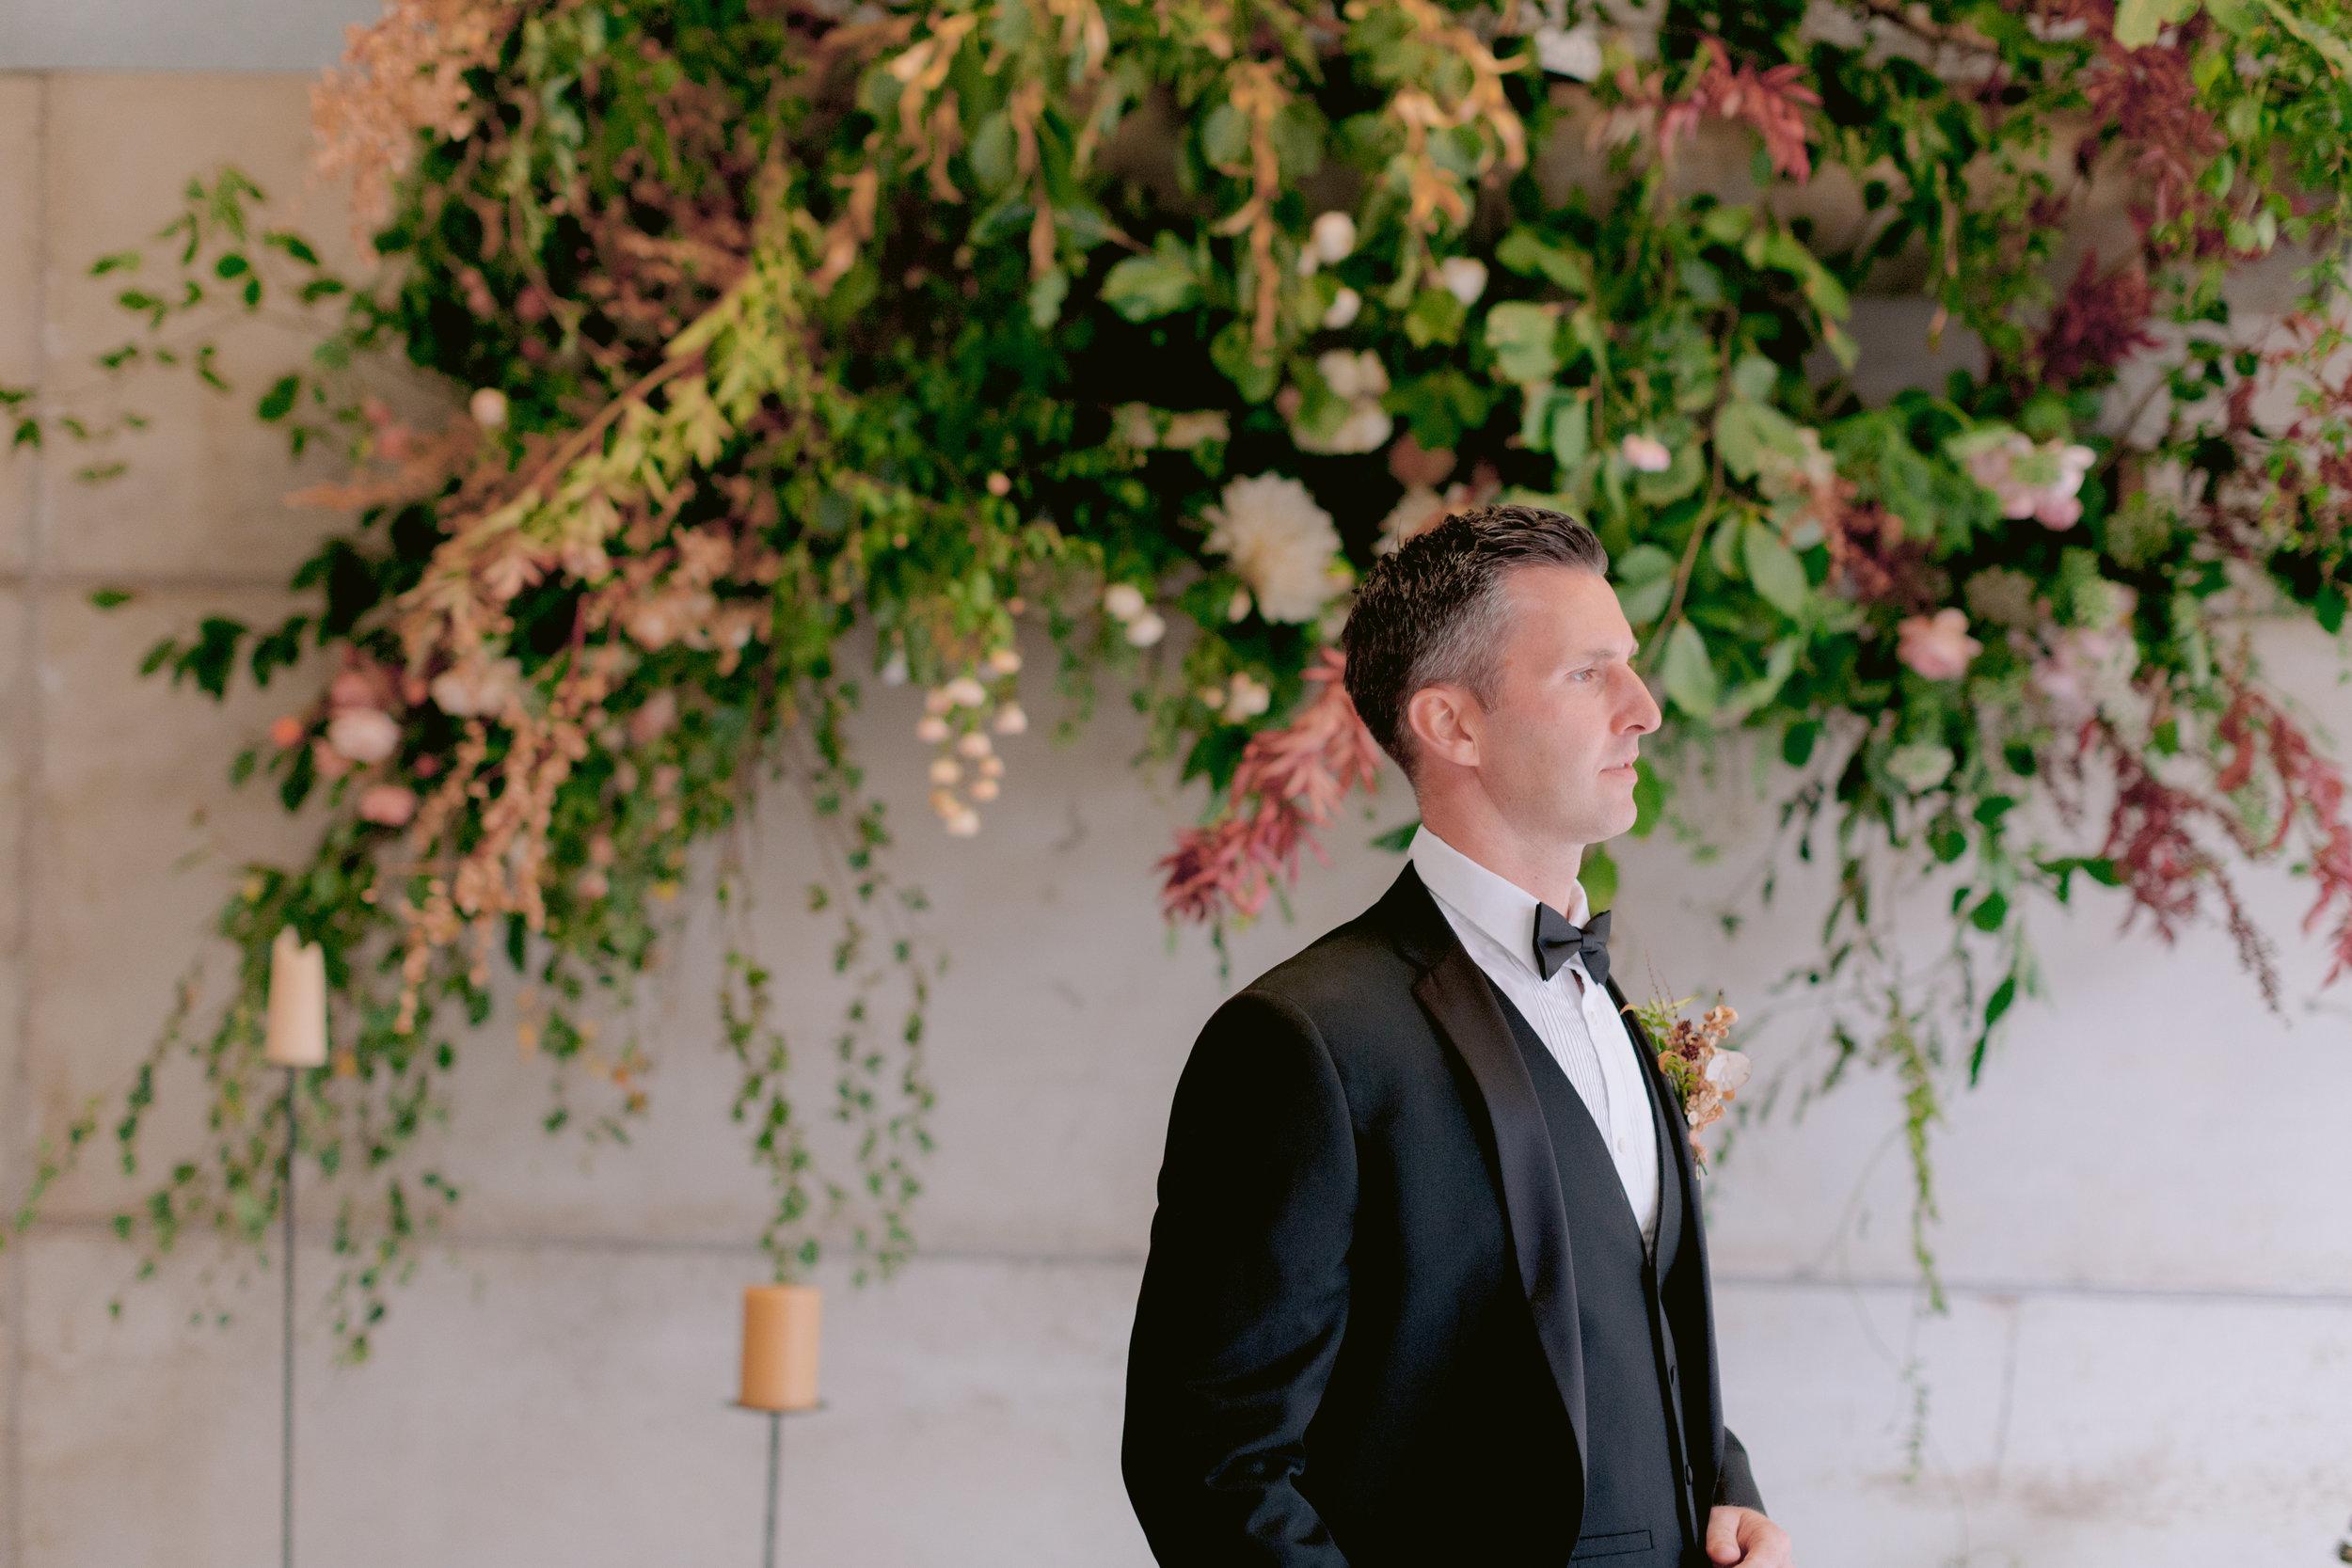 Wedding Fine Art Photography_Groom_UK_Joana Senkute Photography_BelleAndBeauWorkshop_FirenzaFlowers_HolmeFlowers_Yorkshire